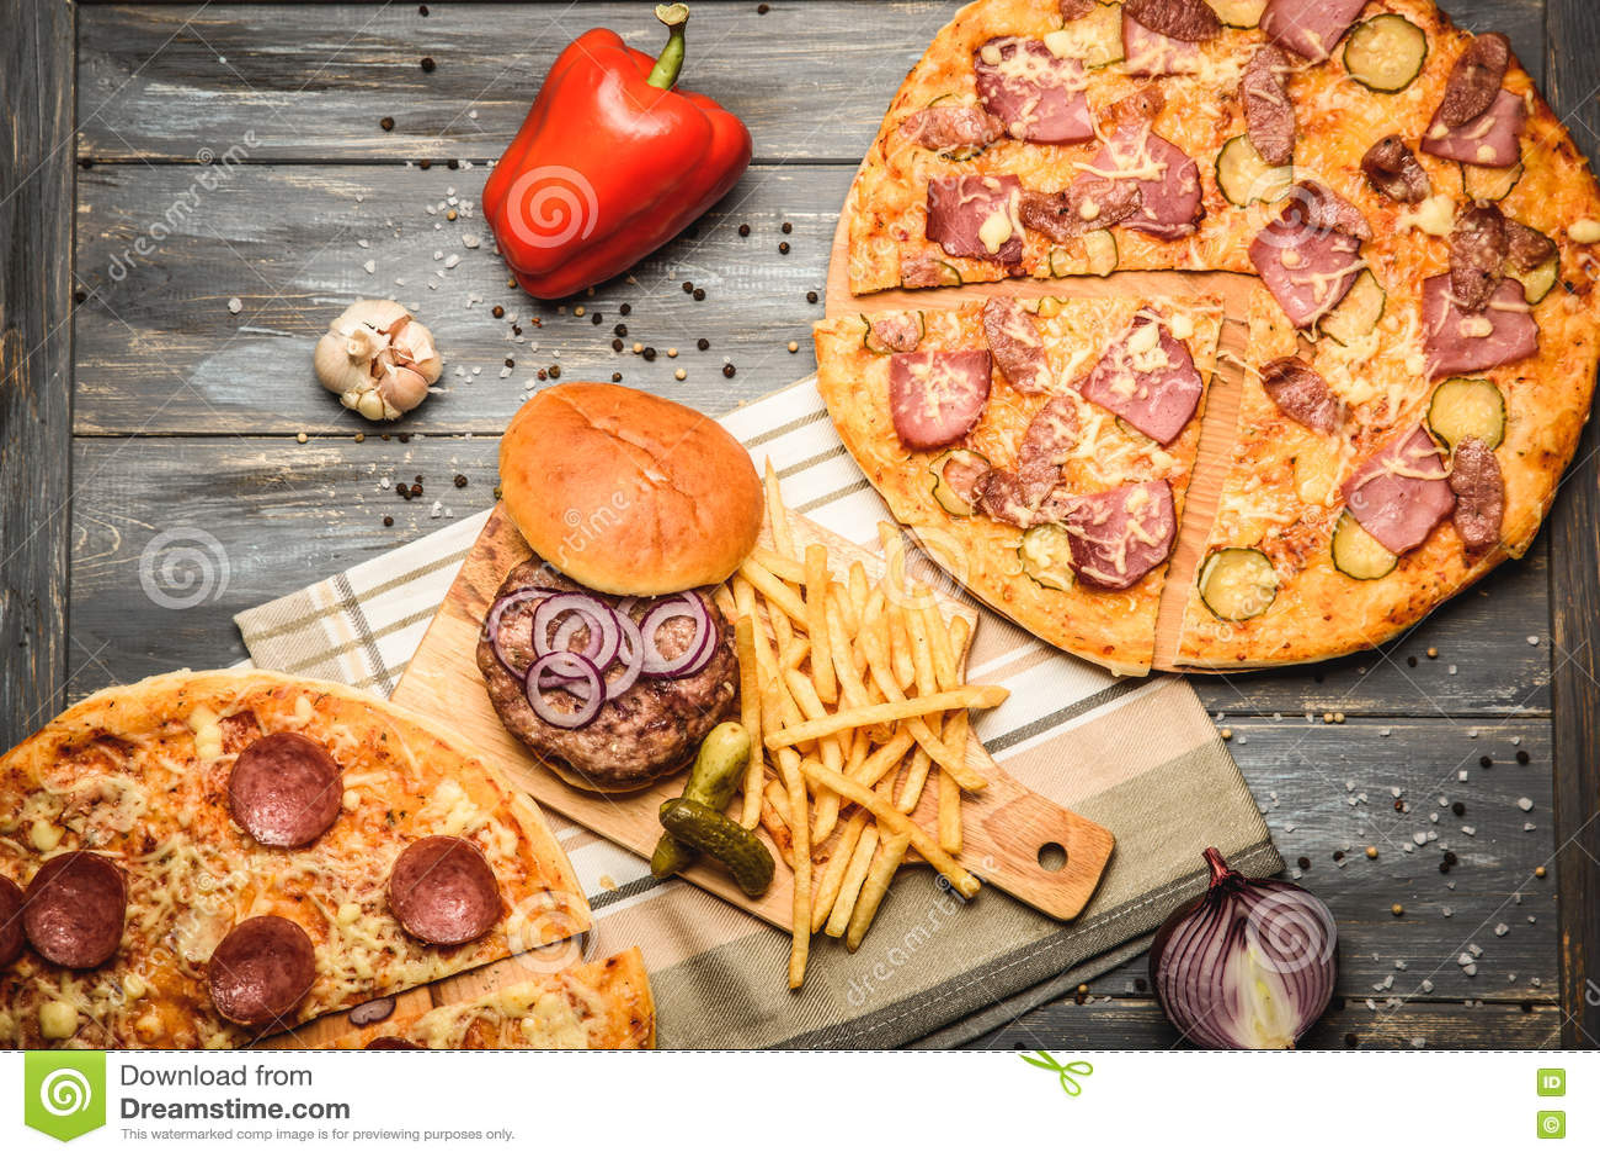 Pizza And Hamburger On Wooden Background Stock Photo Image Of Fresh Lettuce 79600954